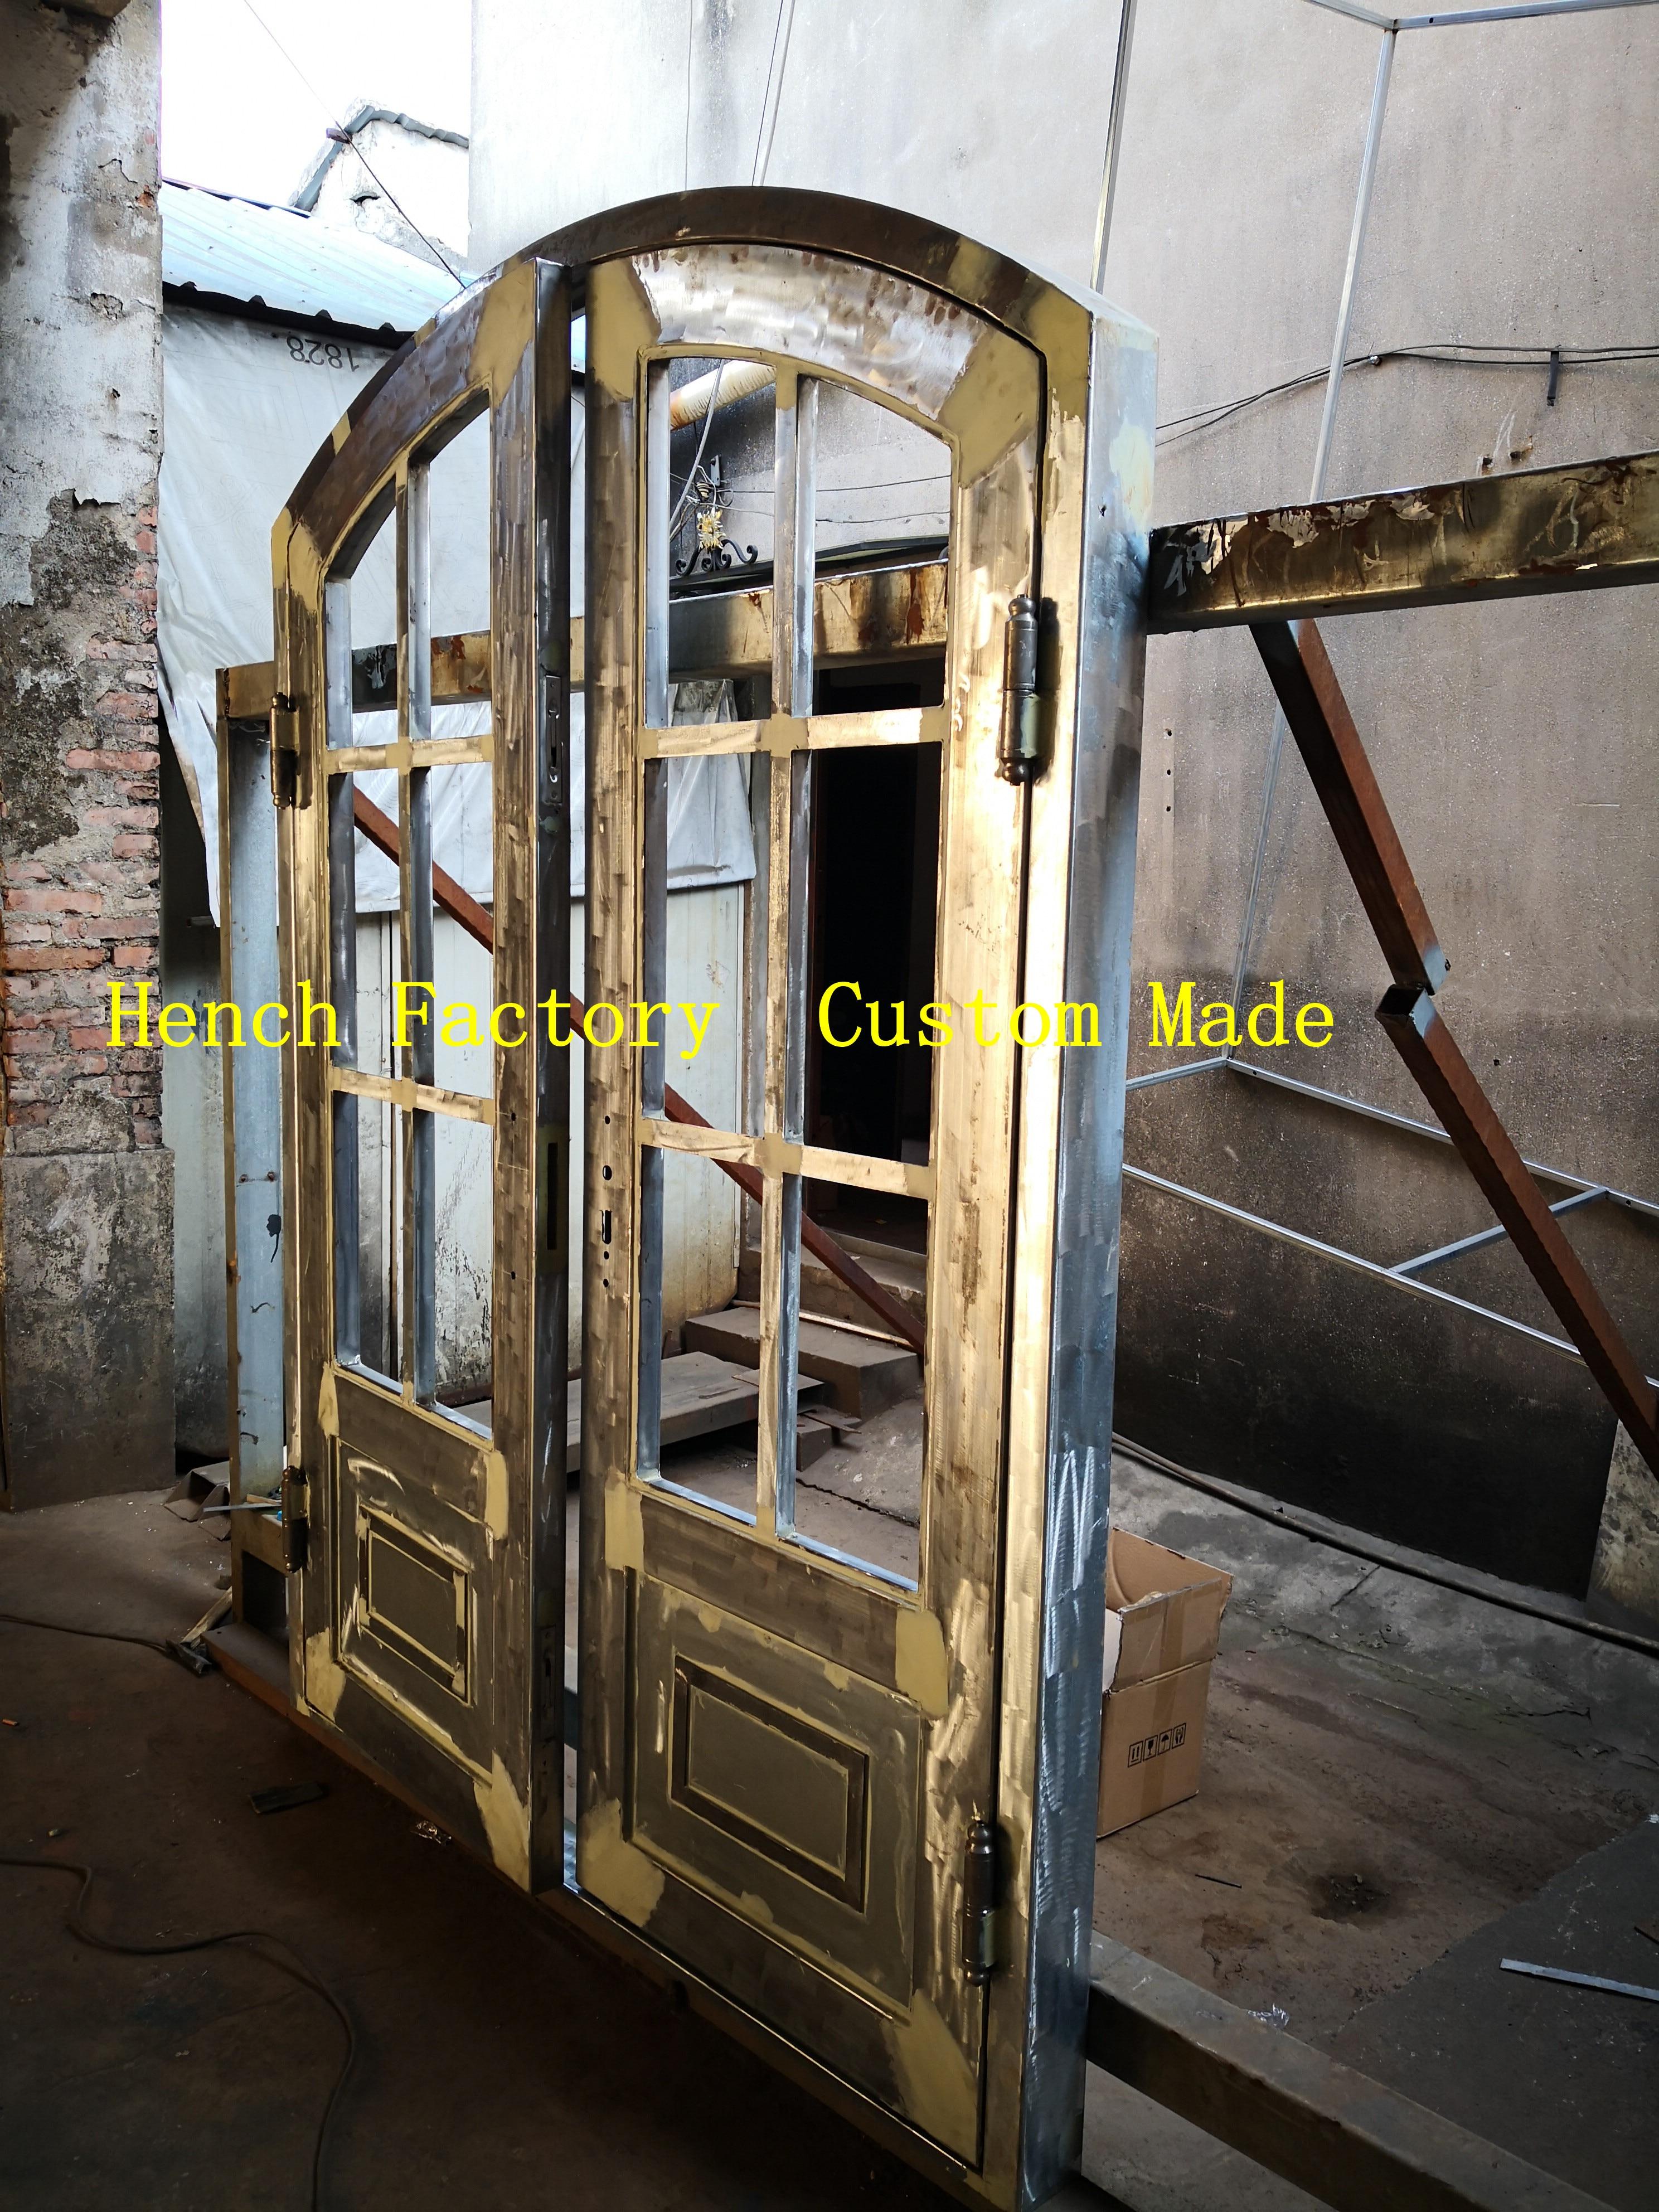 Shanghai Hench Brand China Factory 100% Custom Made Sale Australia Cast Iron Storm Door